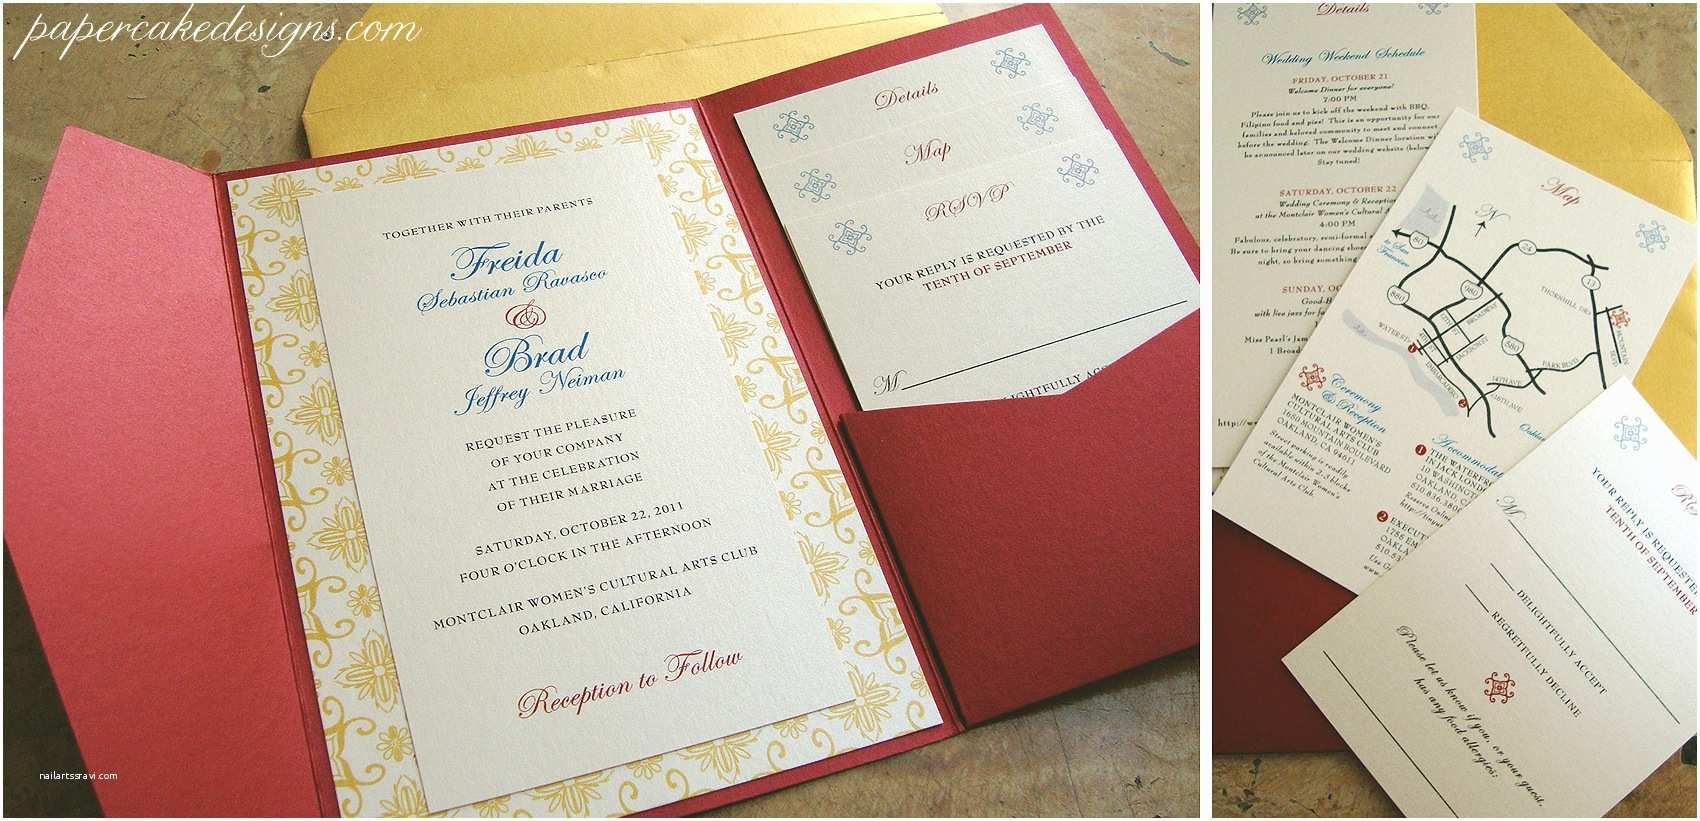 Assembling Wedding Invitations [diy Print & assemble] Wedding Invitations